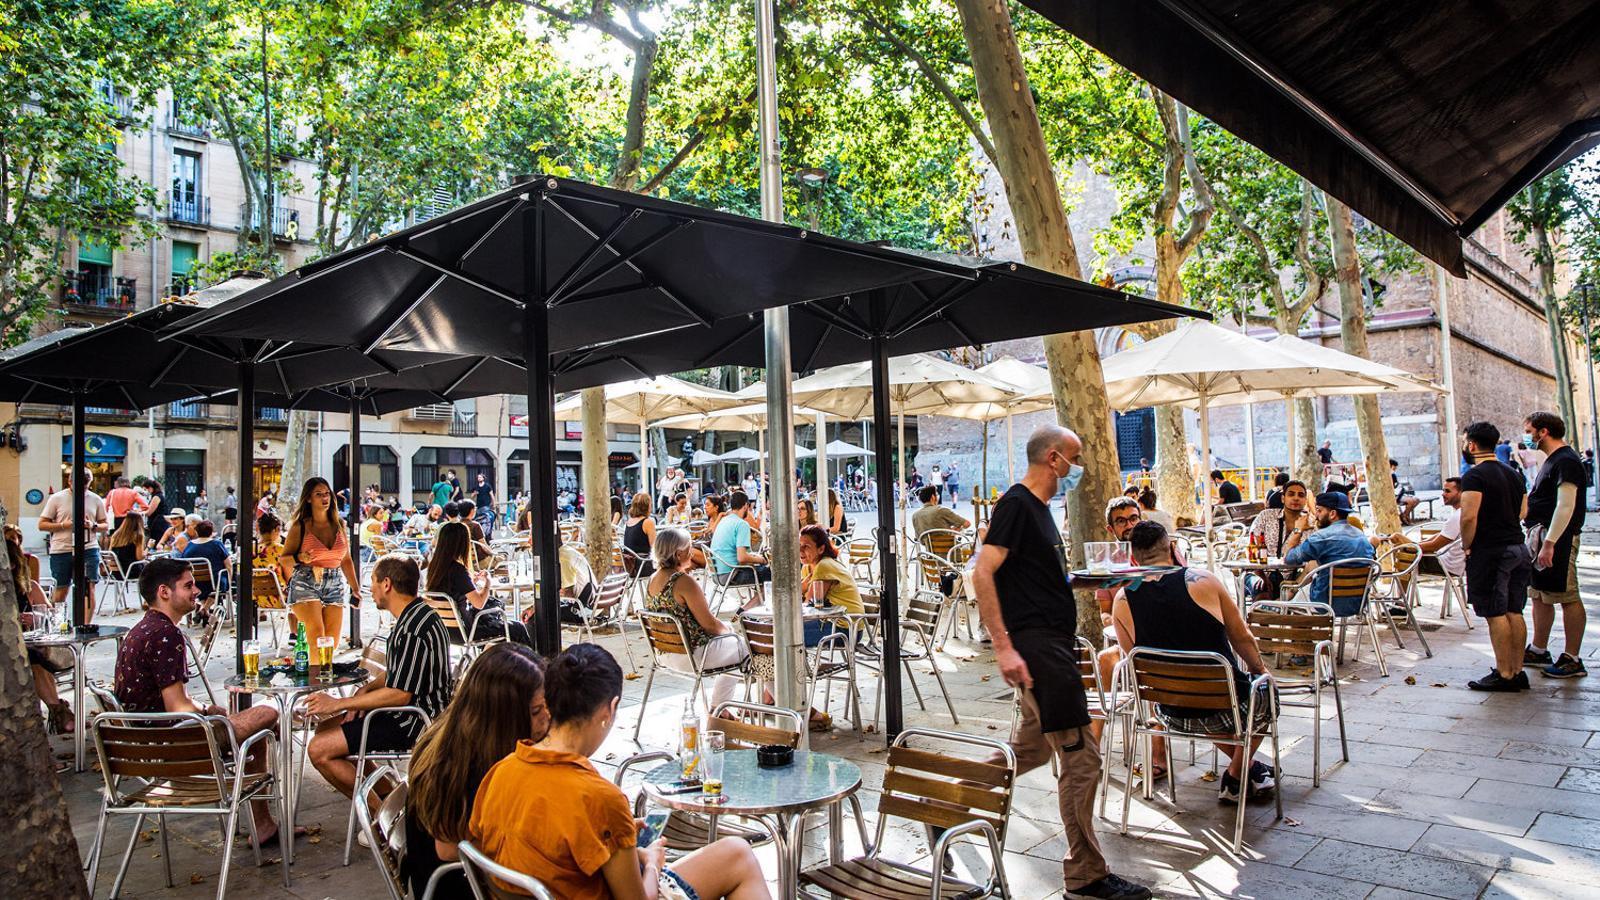 Una terrassa de la plaça de la Virreina de Gràcia el primer dia de la mascareta obligatòria.